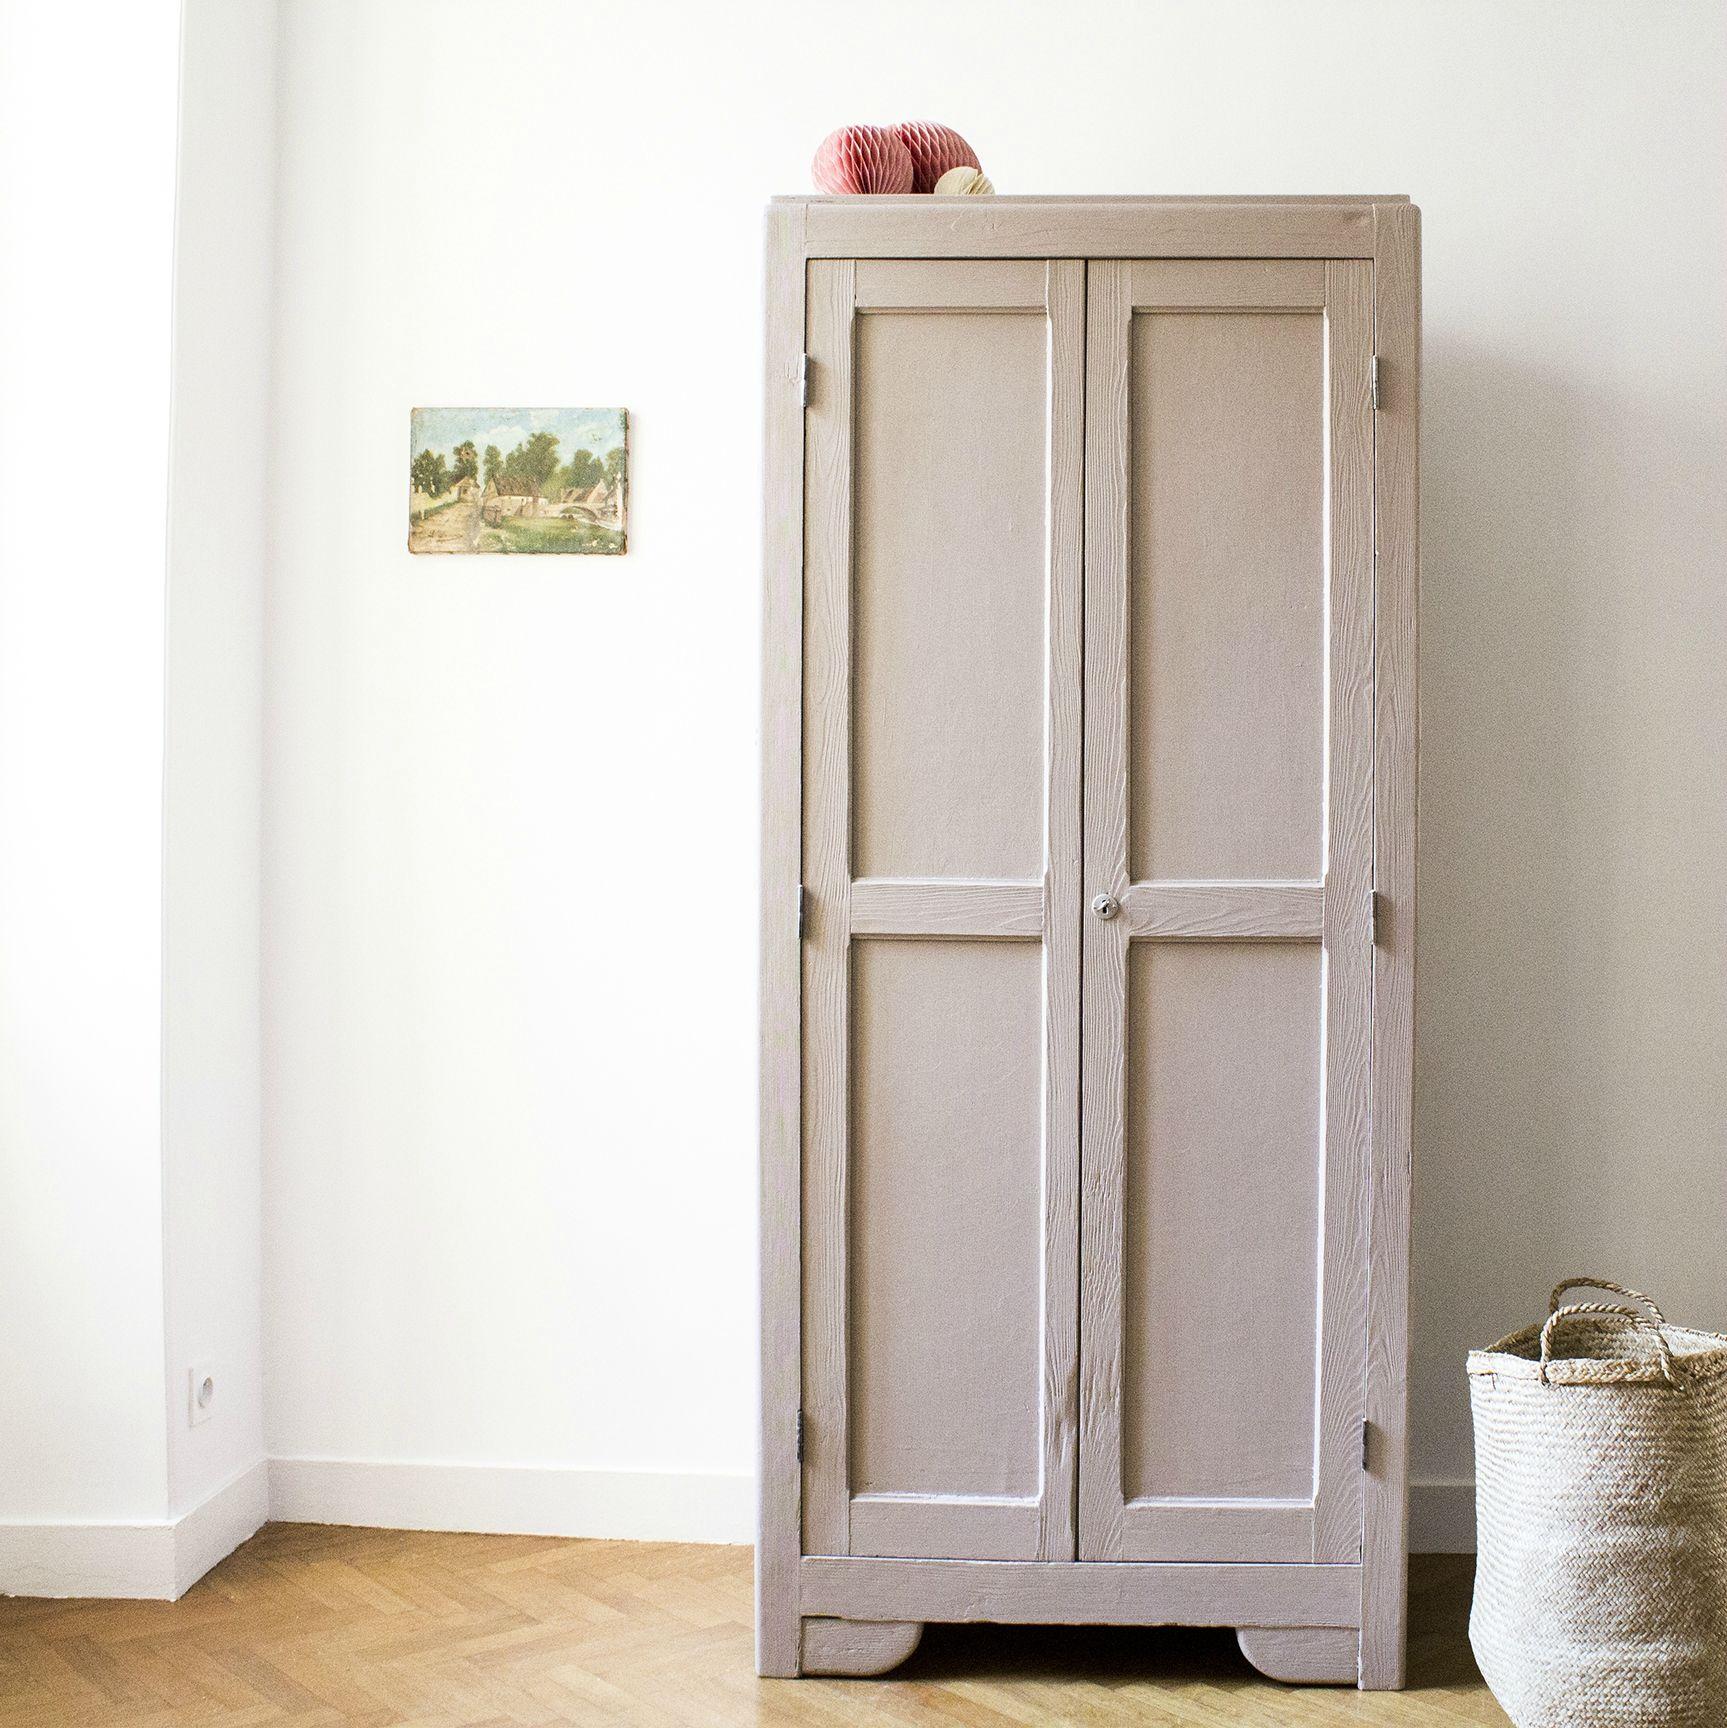 front door dead salmon farrow ball home paint ideas pinterest. Black Bedroom Furniture Sets. Home Design Ideas